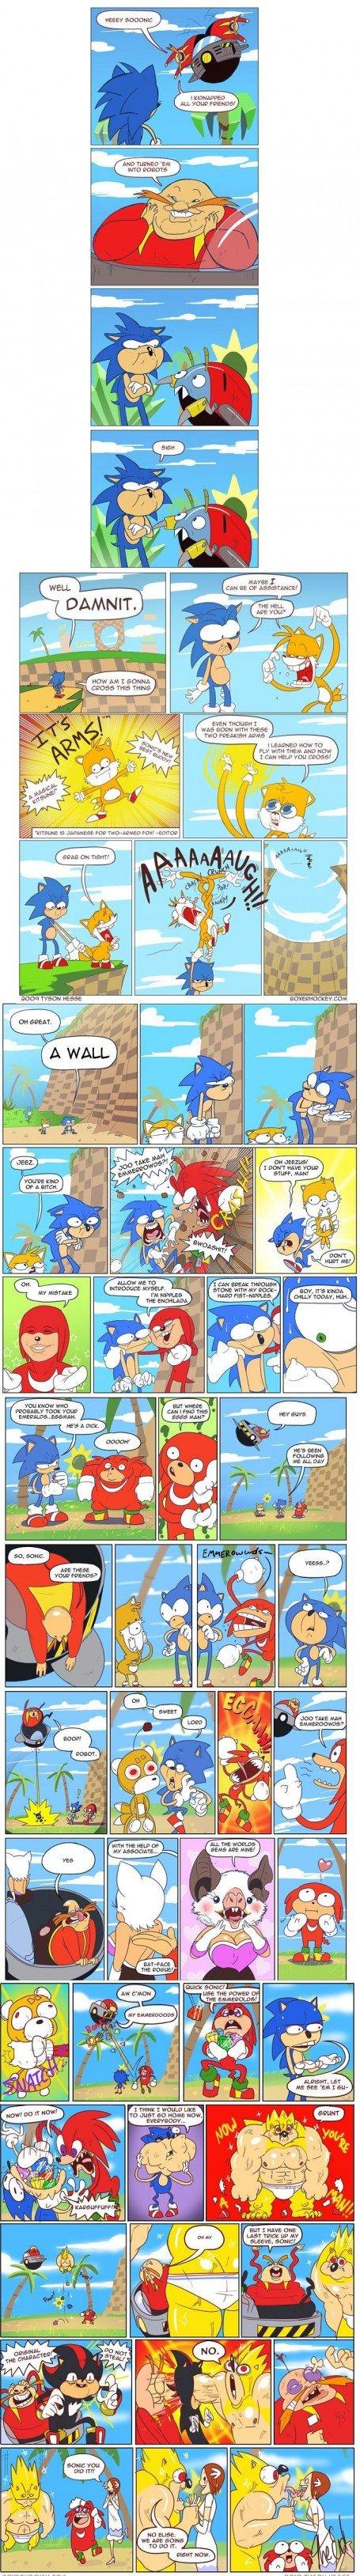 Sonic's adventure. . Hia mm T APE! Sonic's adventure Hia mm T APE!